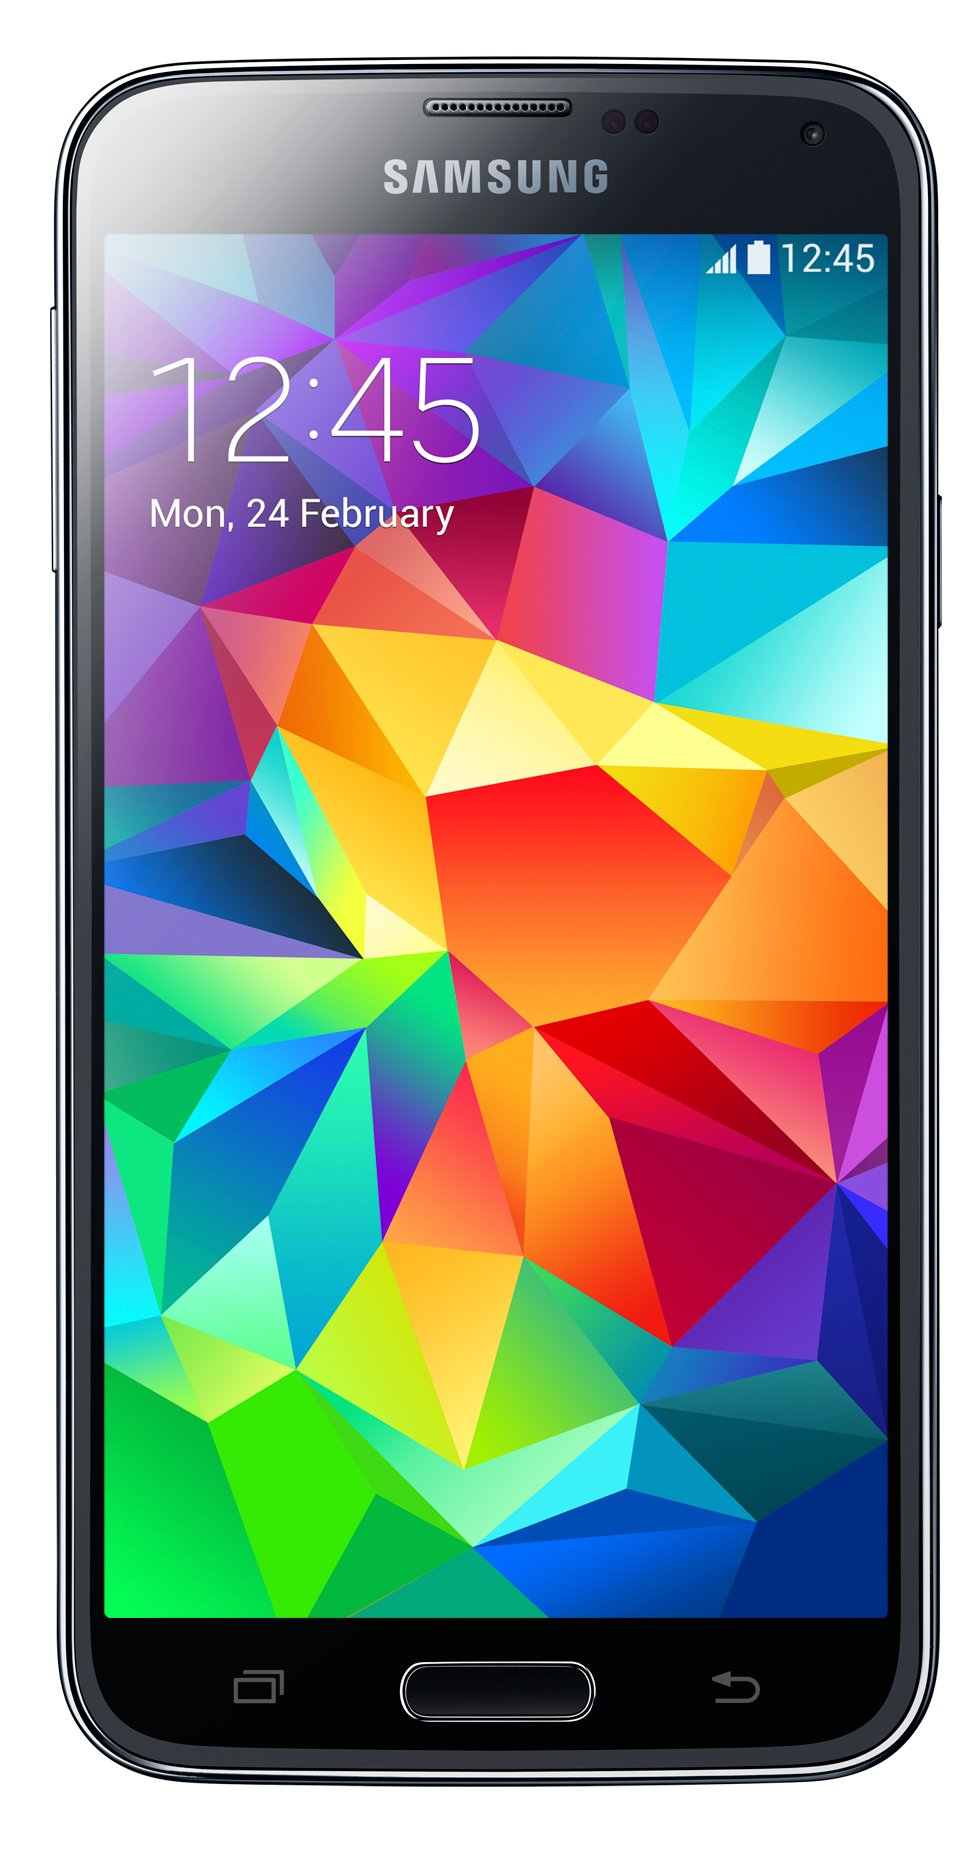 Samsung Galaxy S5 G900FD DUOS 4G LTE 16GB Unlocked GSM Dual-SIM Quad-Core Smartphone - Retail Packaging - Black